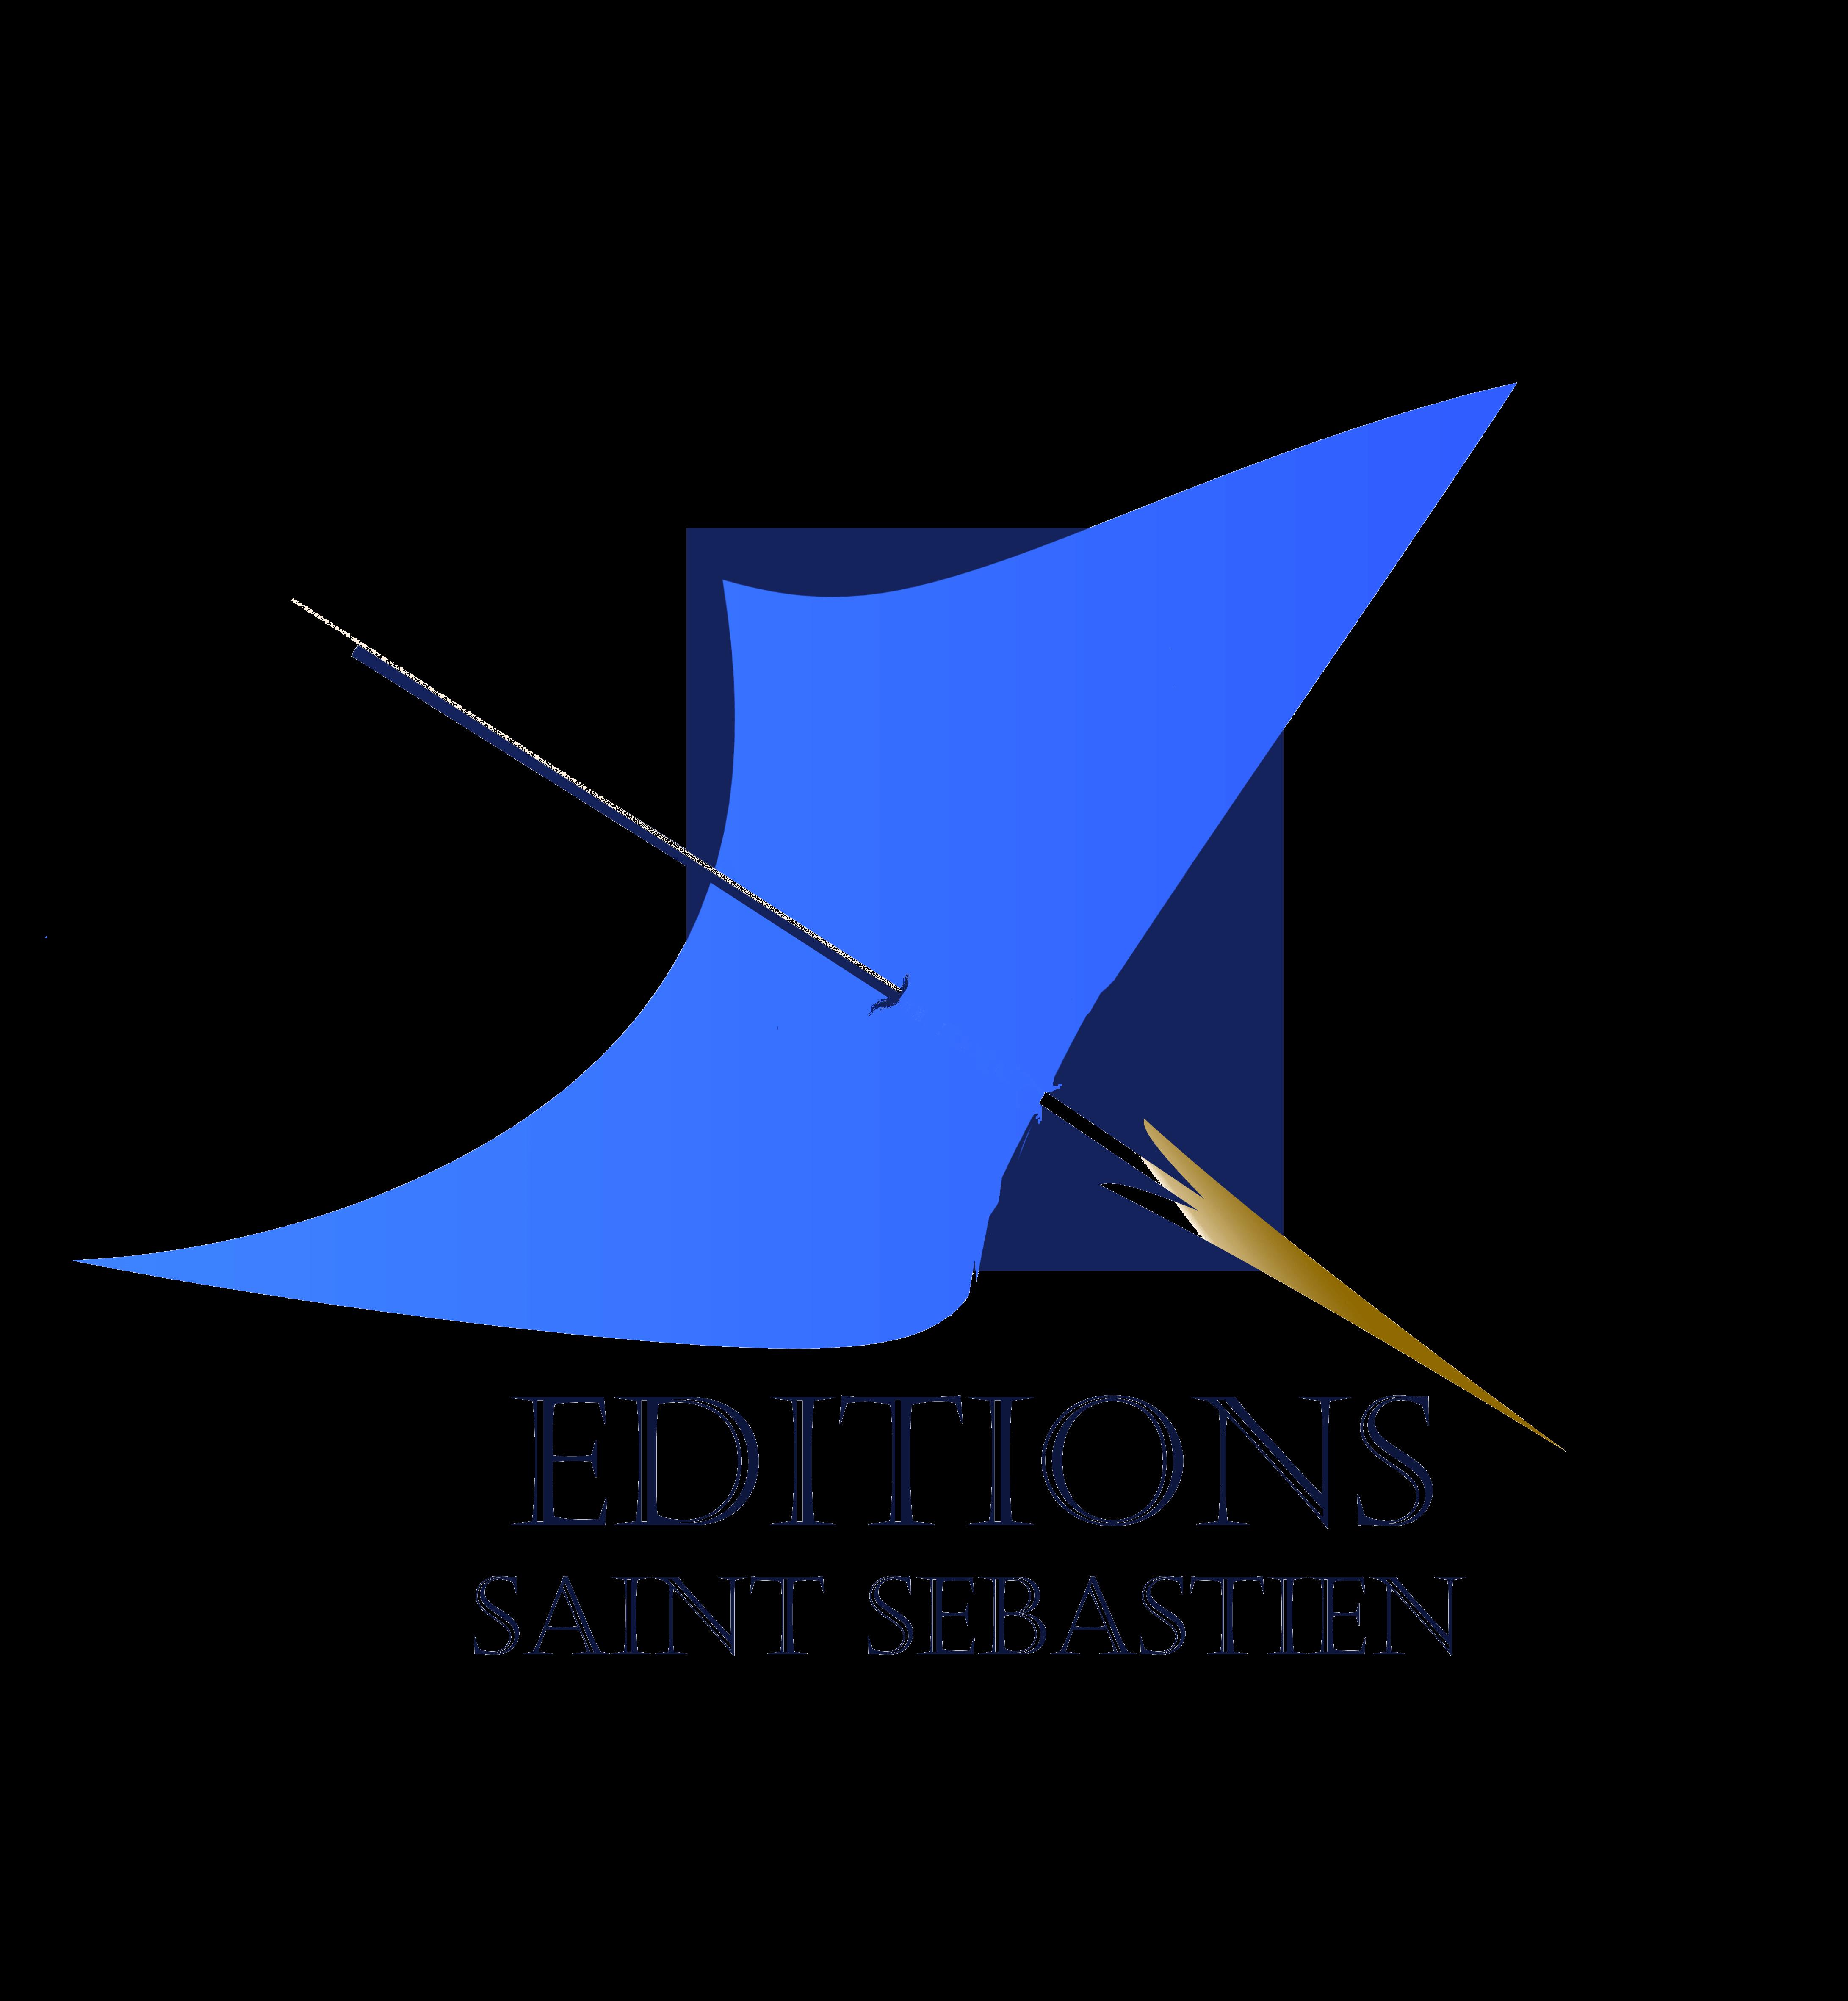 Editions Saint-Sébastien